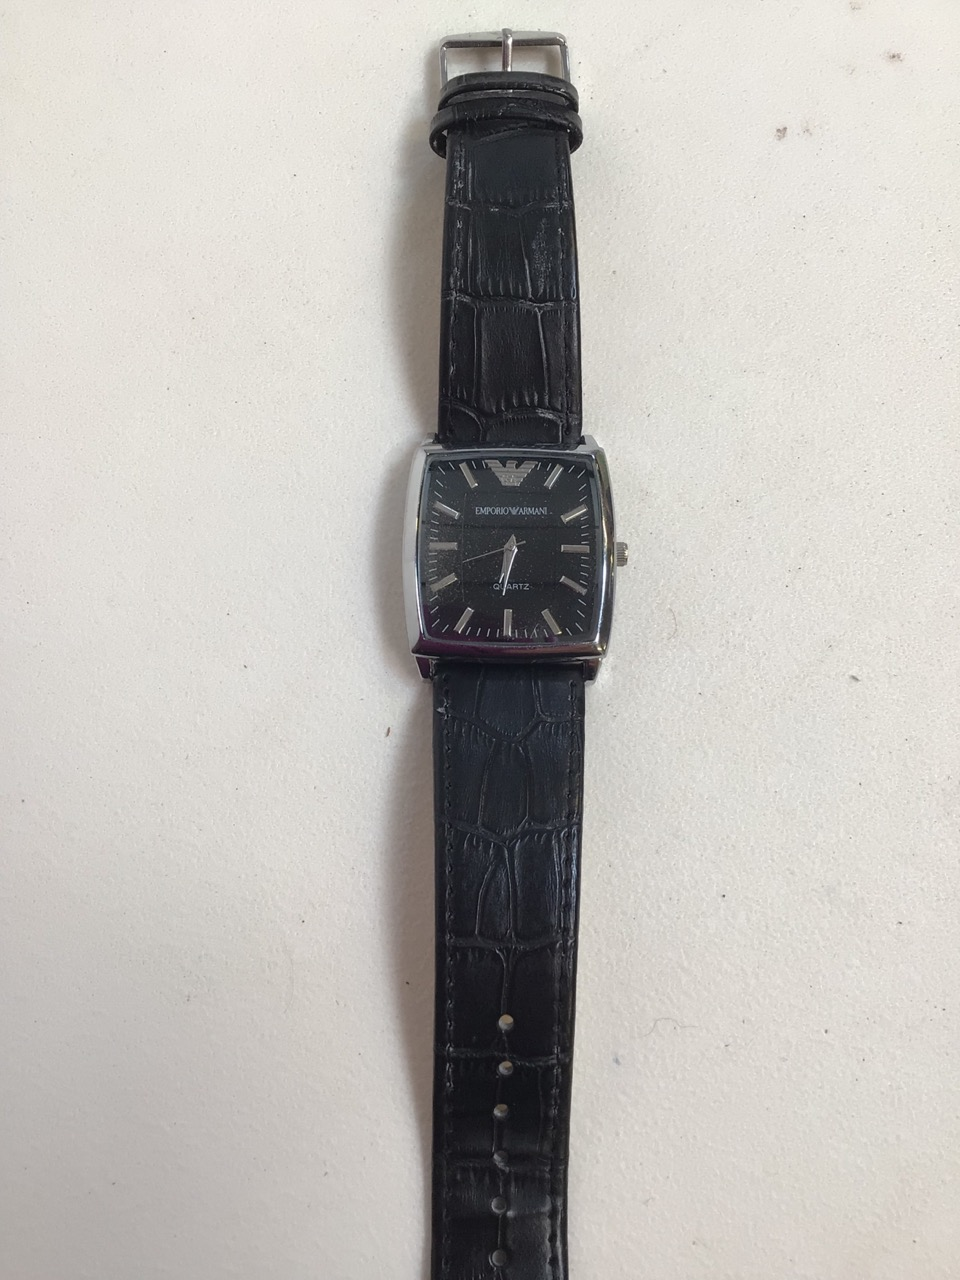 A Emporio Armani Quartz watch. - Image 3 of 3